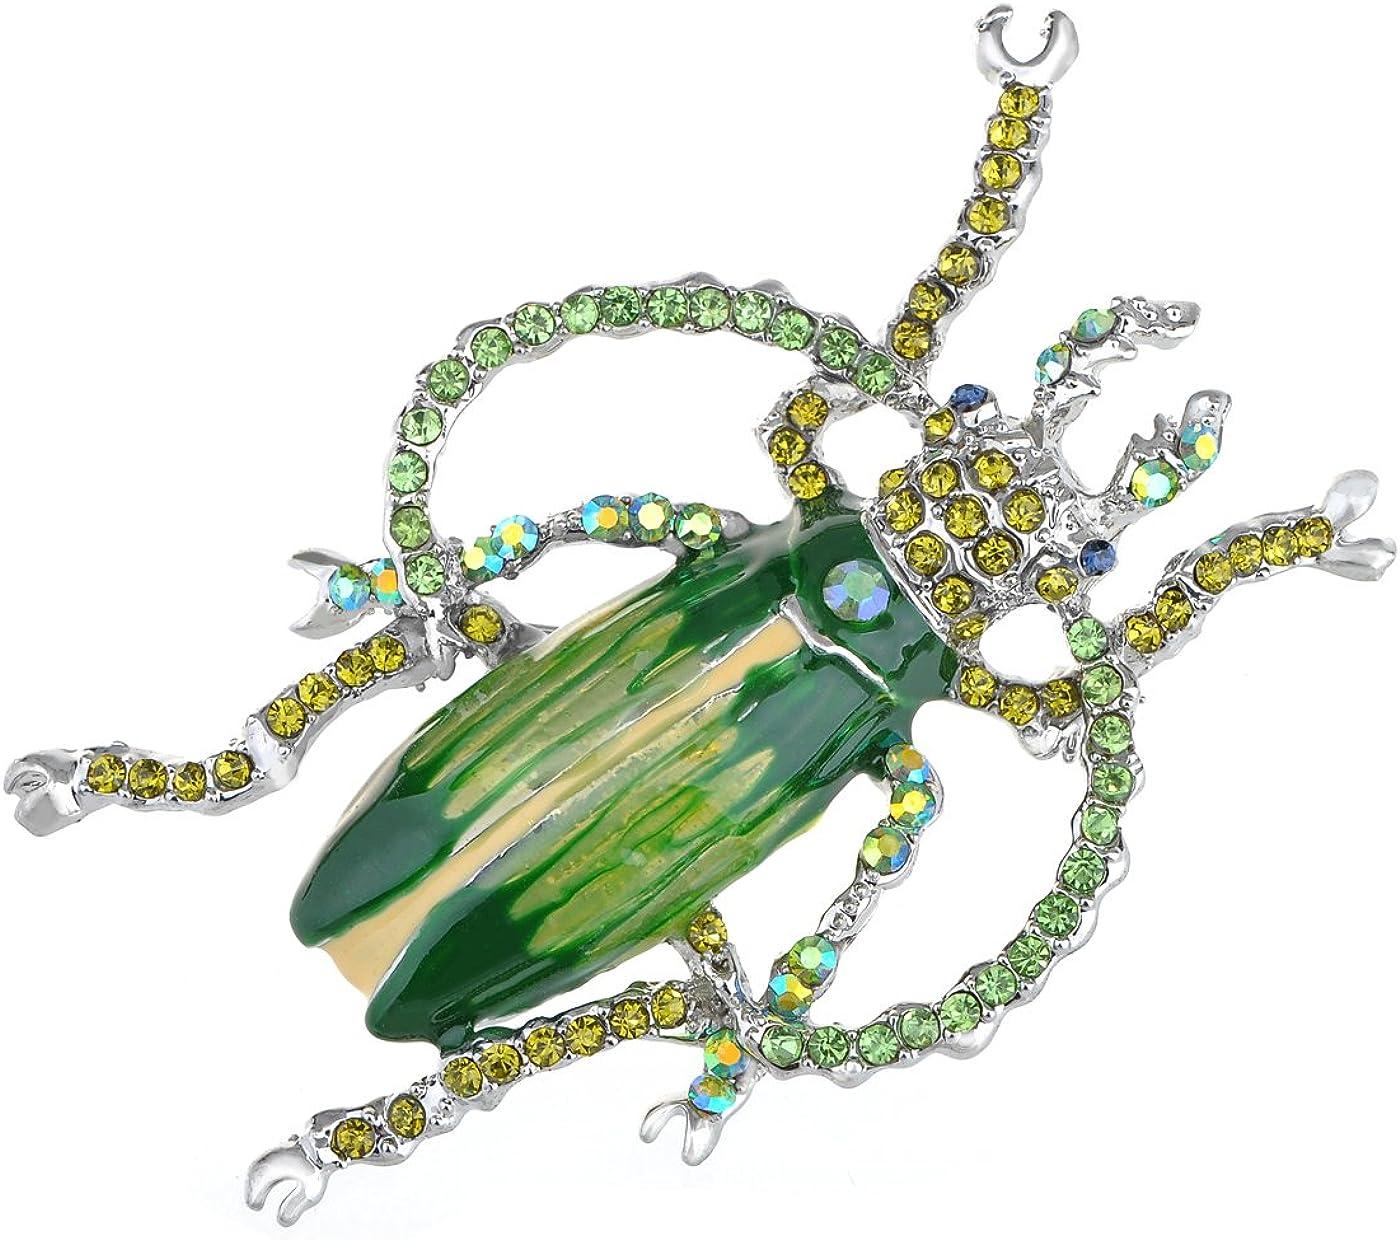 Alilang Handpainted Enamel Peridot Green Color Crystal Rhinestone Beetle Insect Bug Lapel Pin Brooch